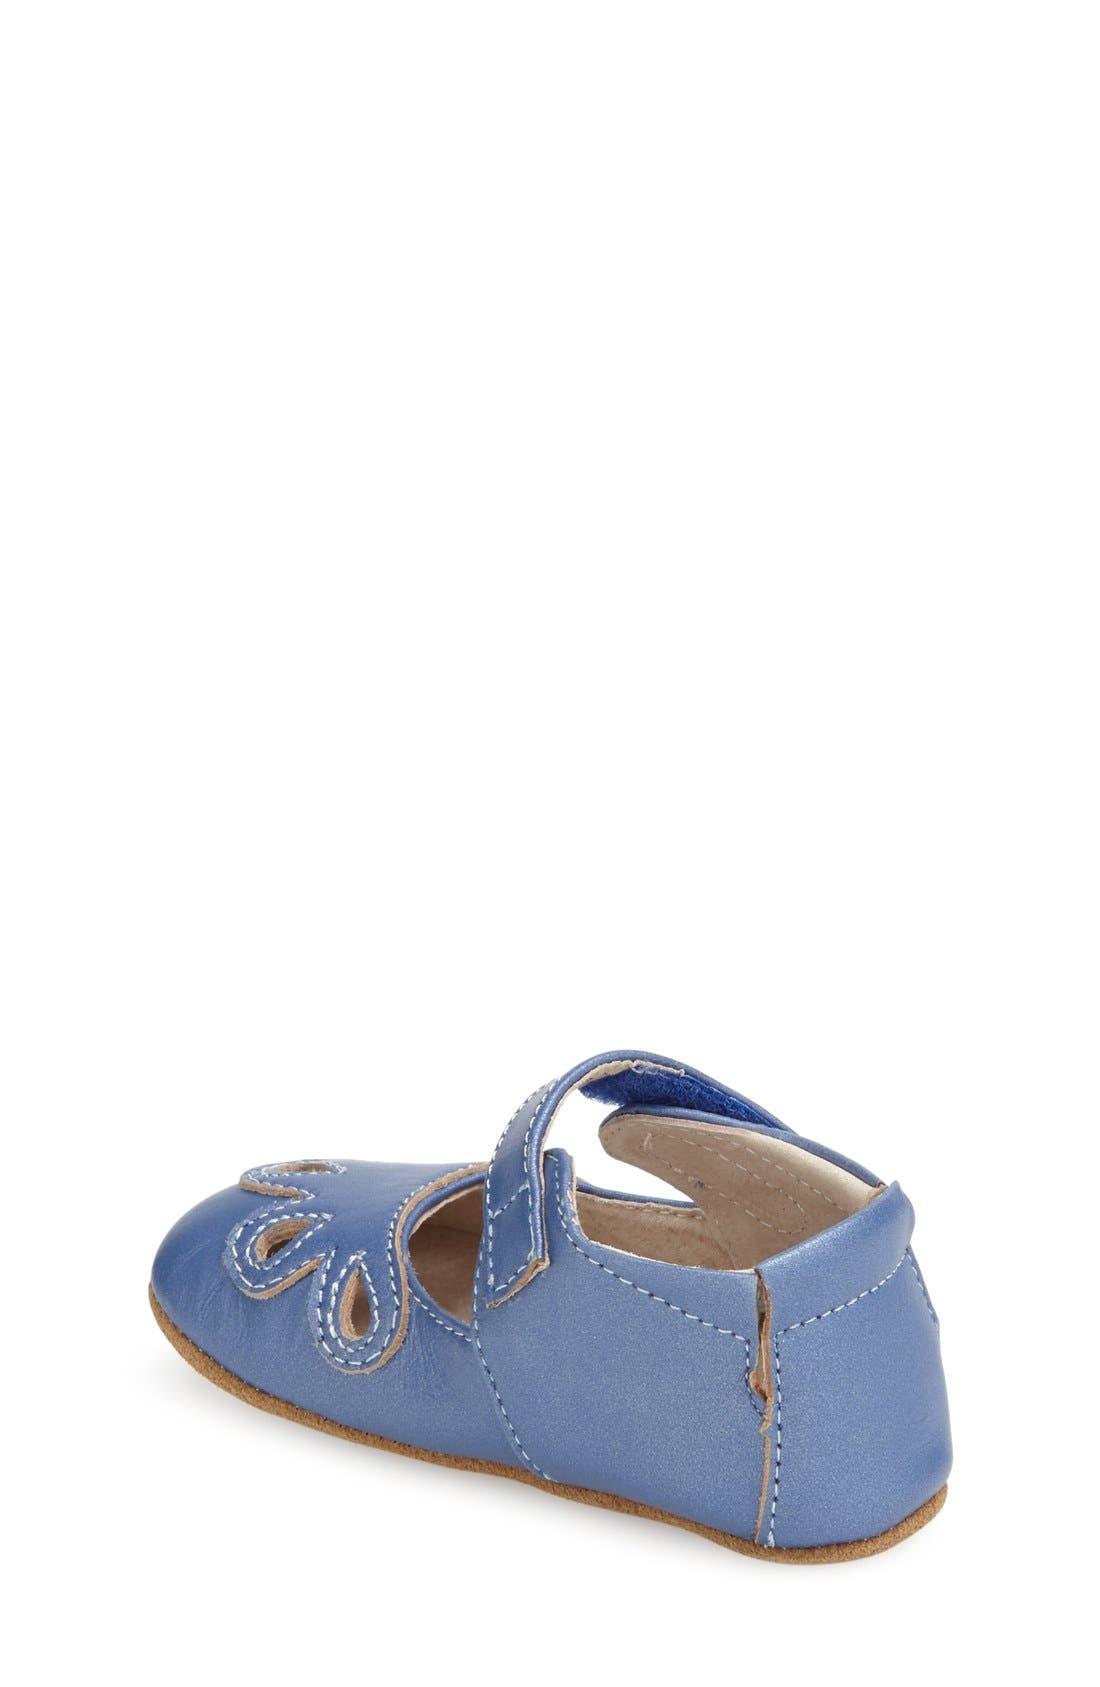 'Petal' Mary Jane Crib Shoe,                             Alternate thumbnail 7, color,